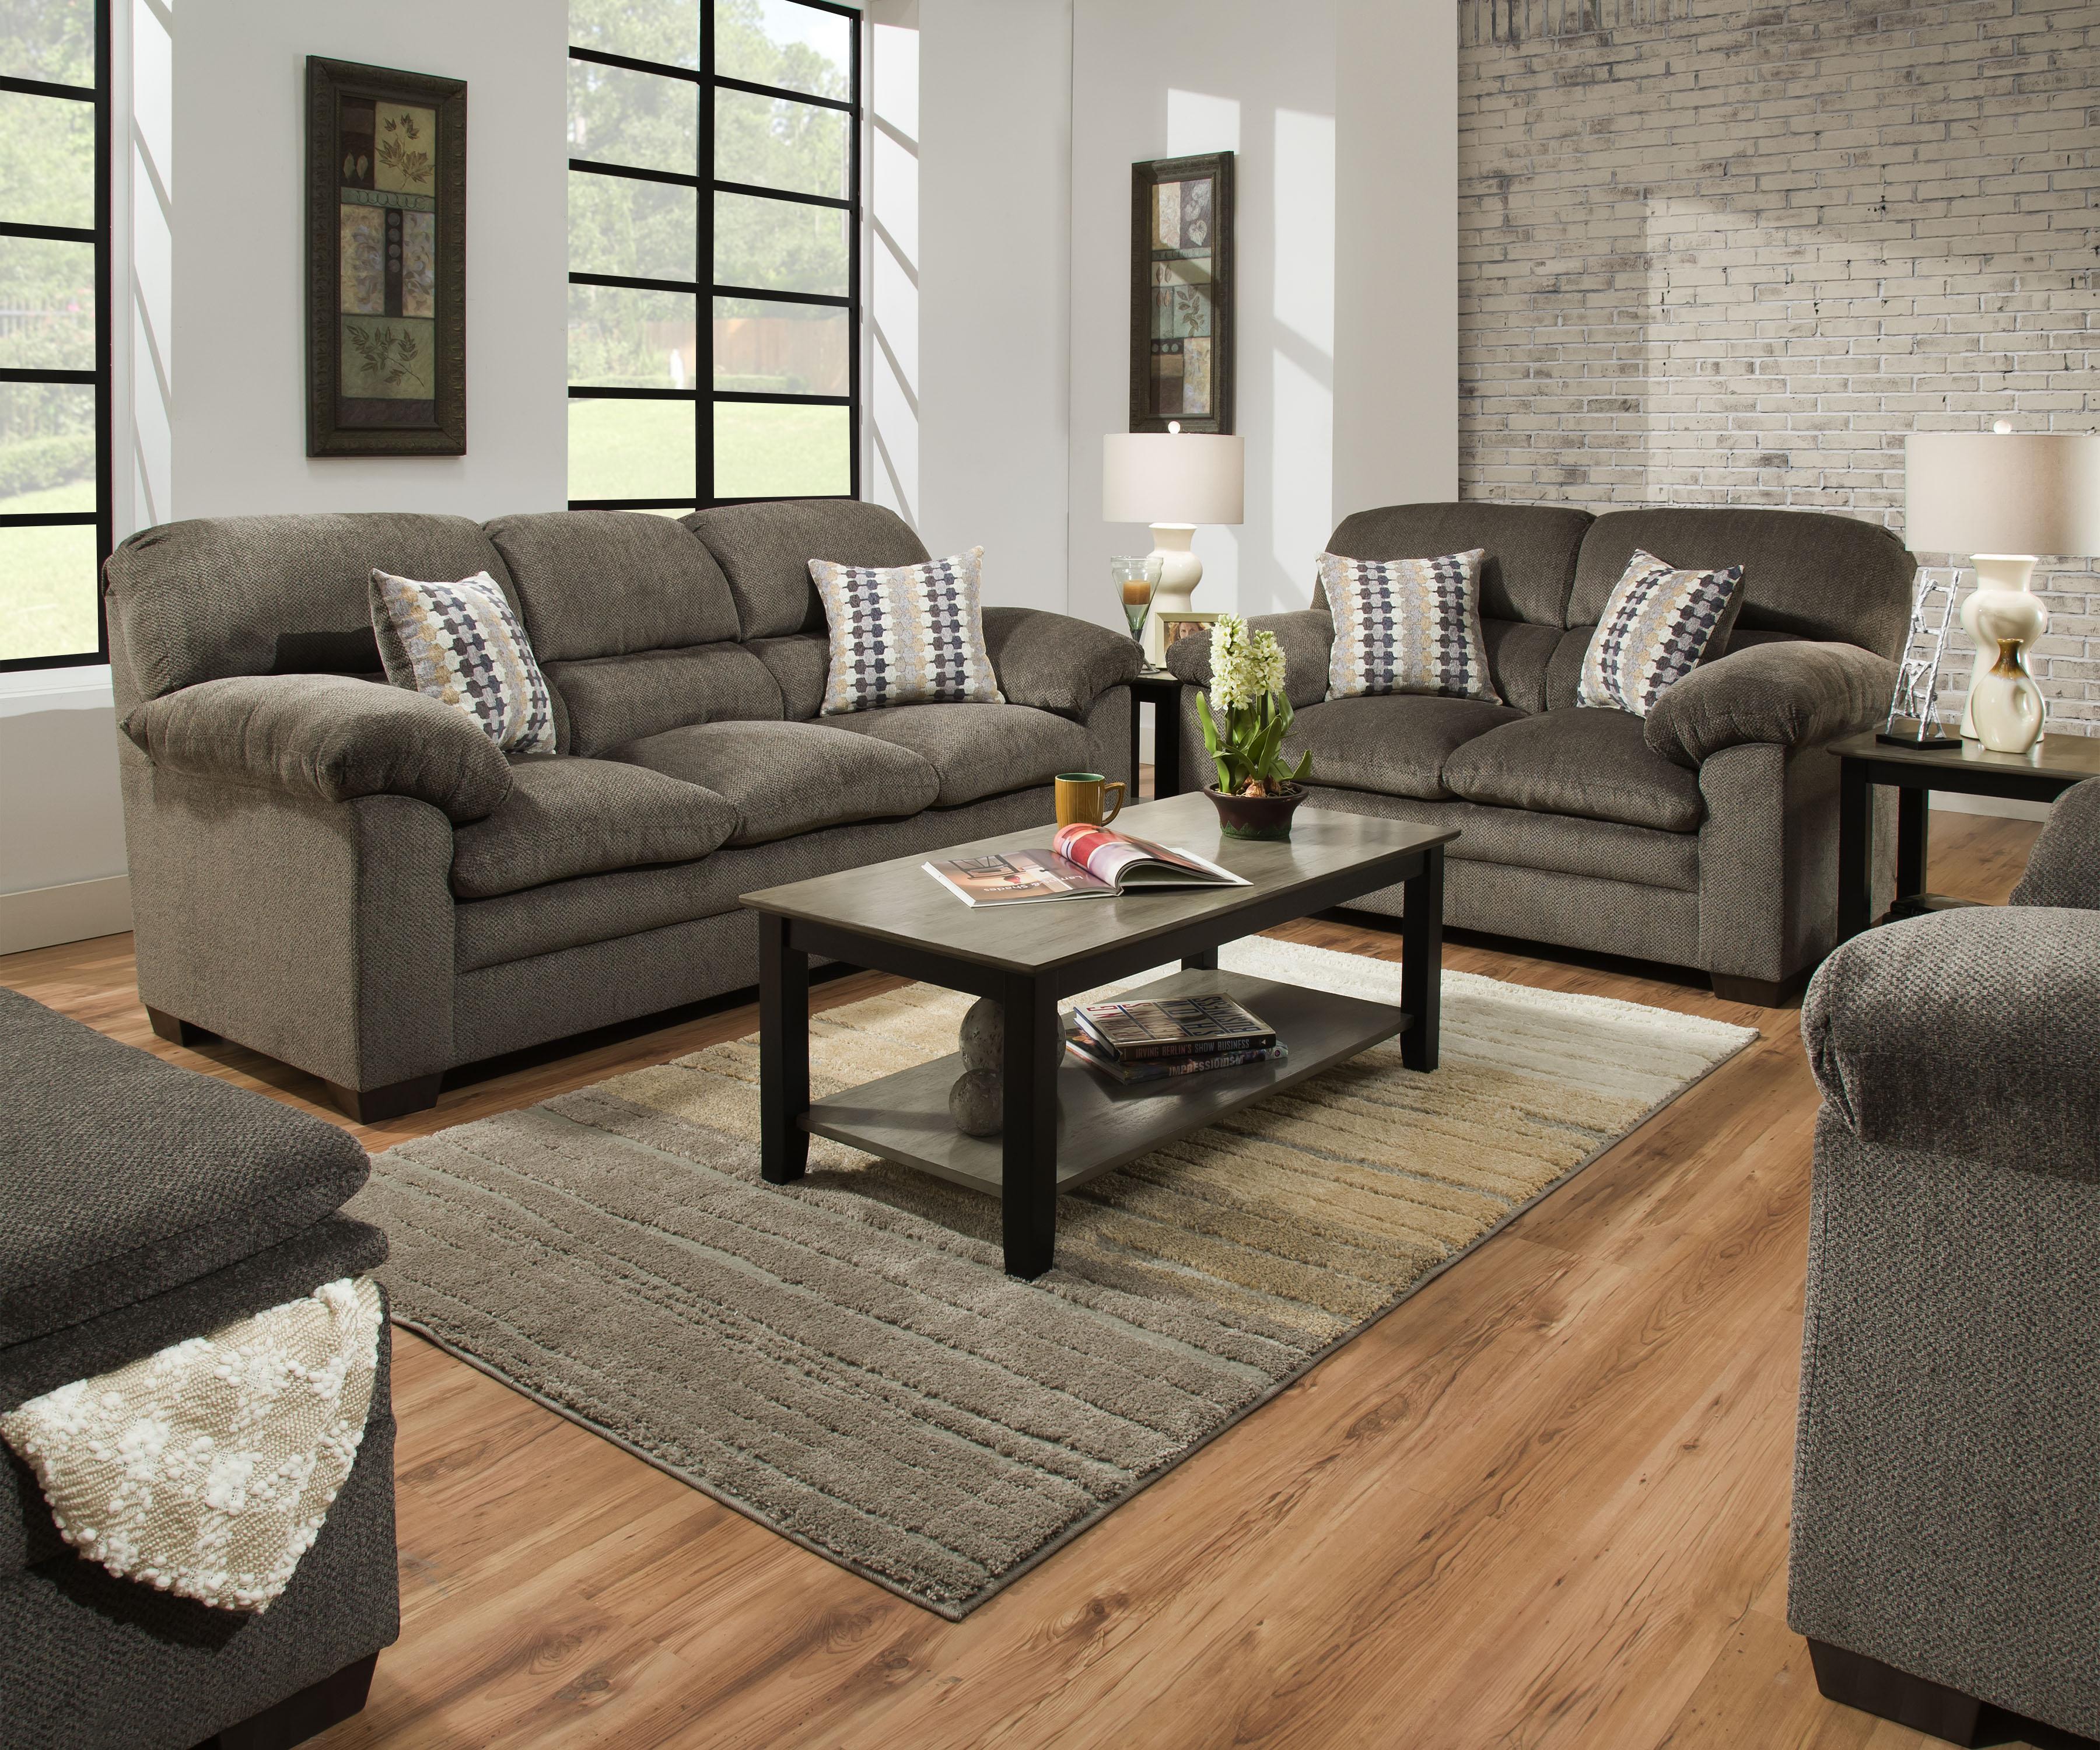 3683 Sofa and Loveseat in Harlow Ash $799